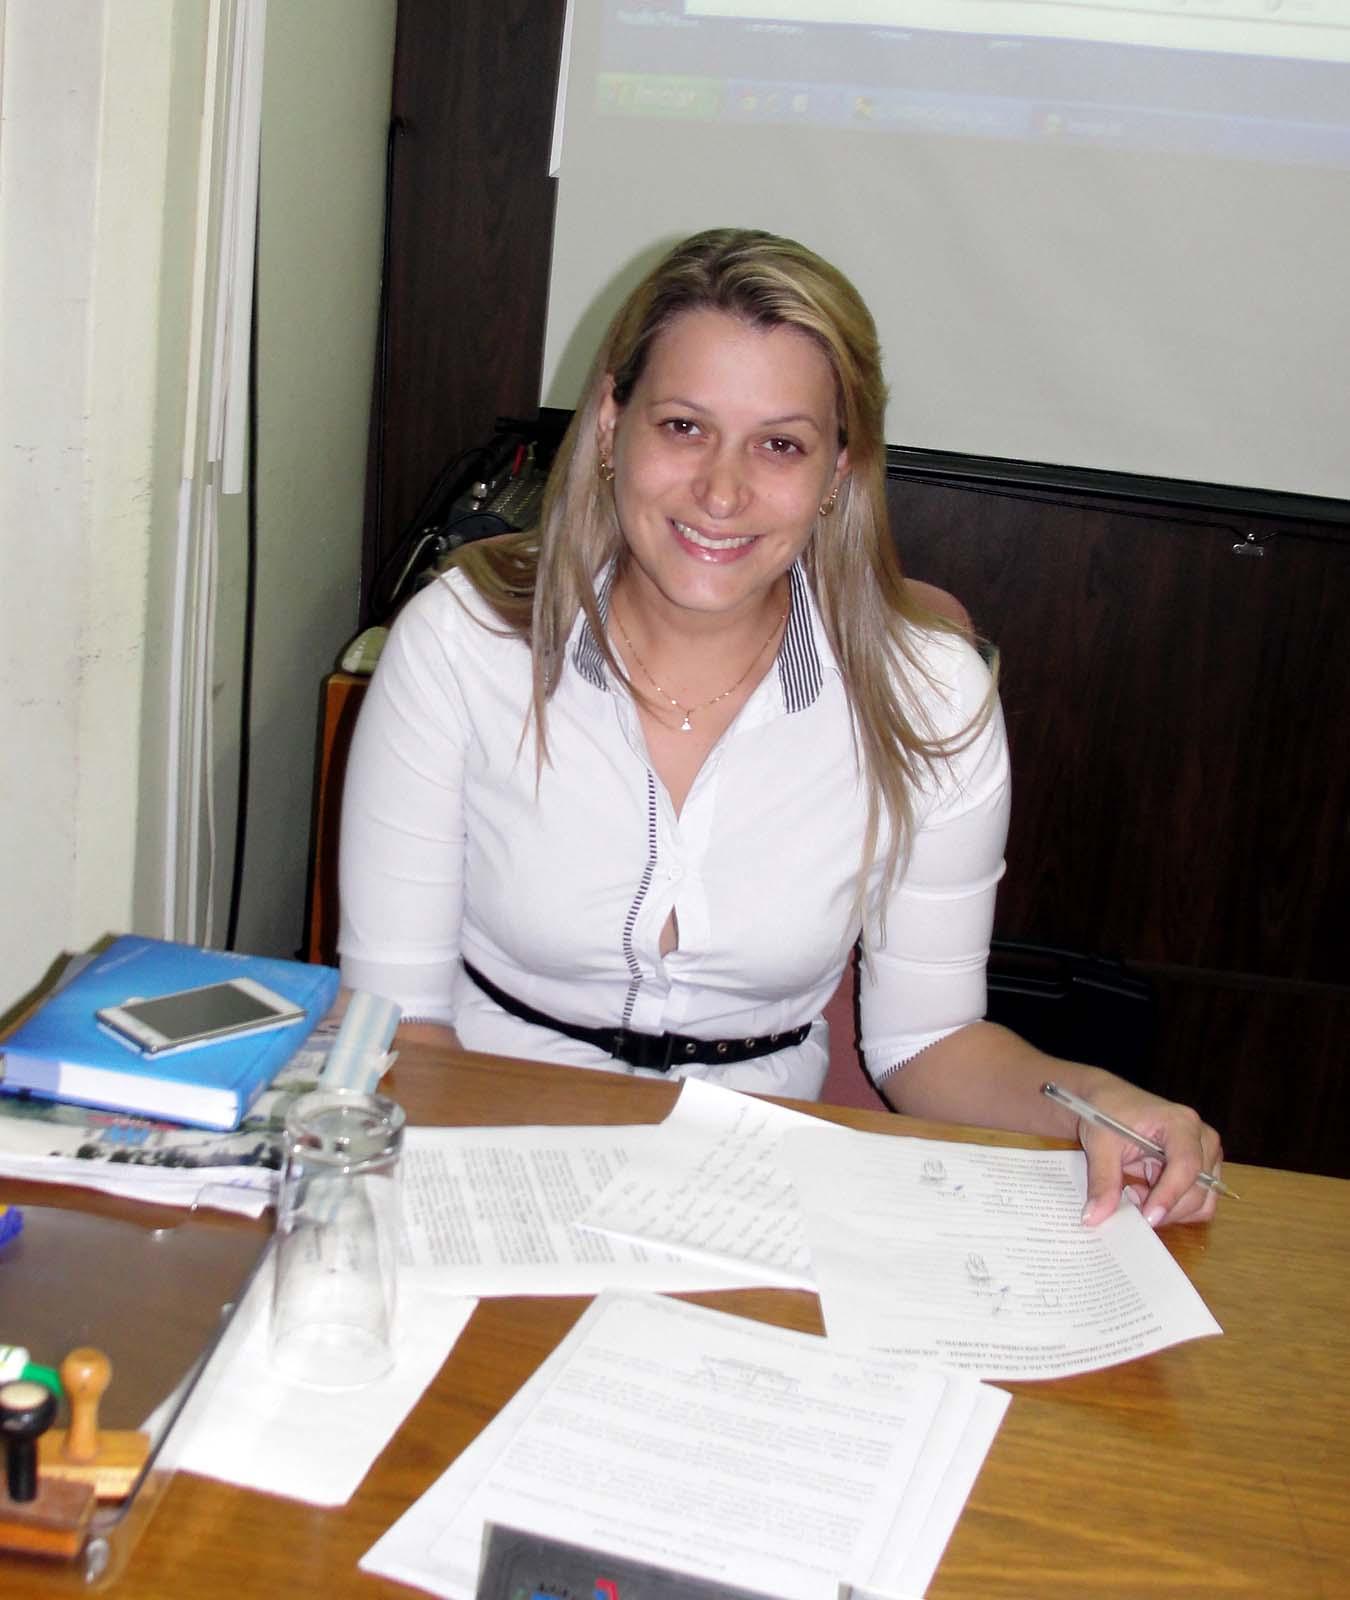 Vereadora Franciele Danelon lembrou as qualidades de Lilian